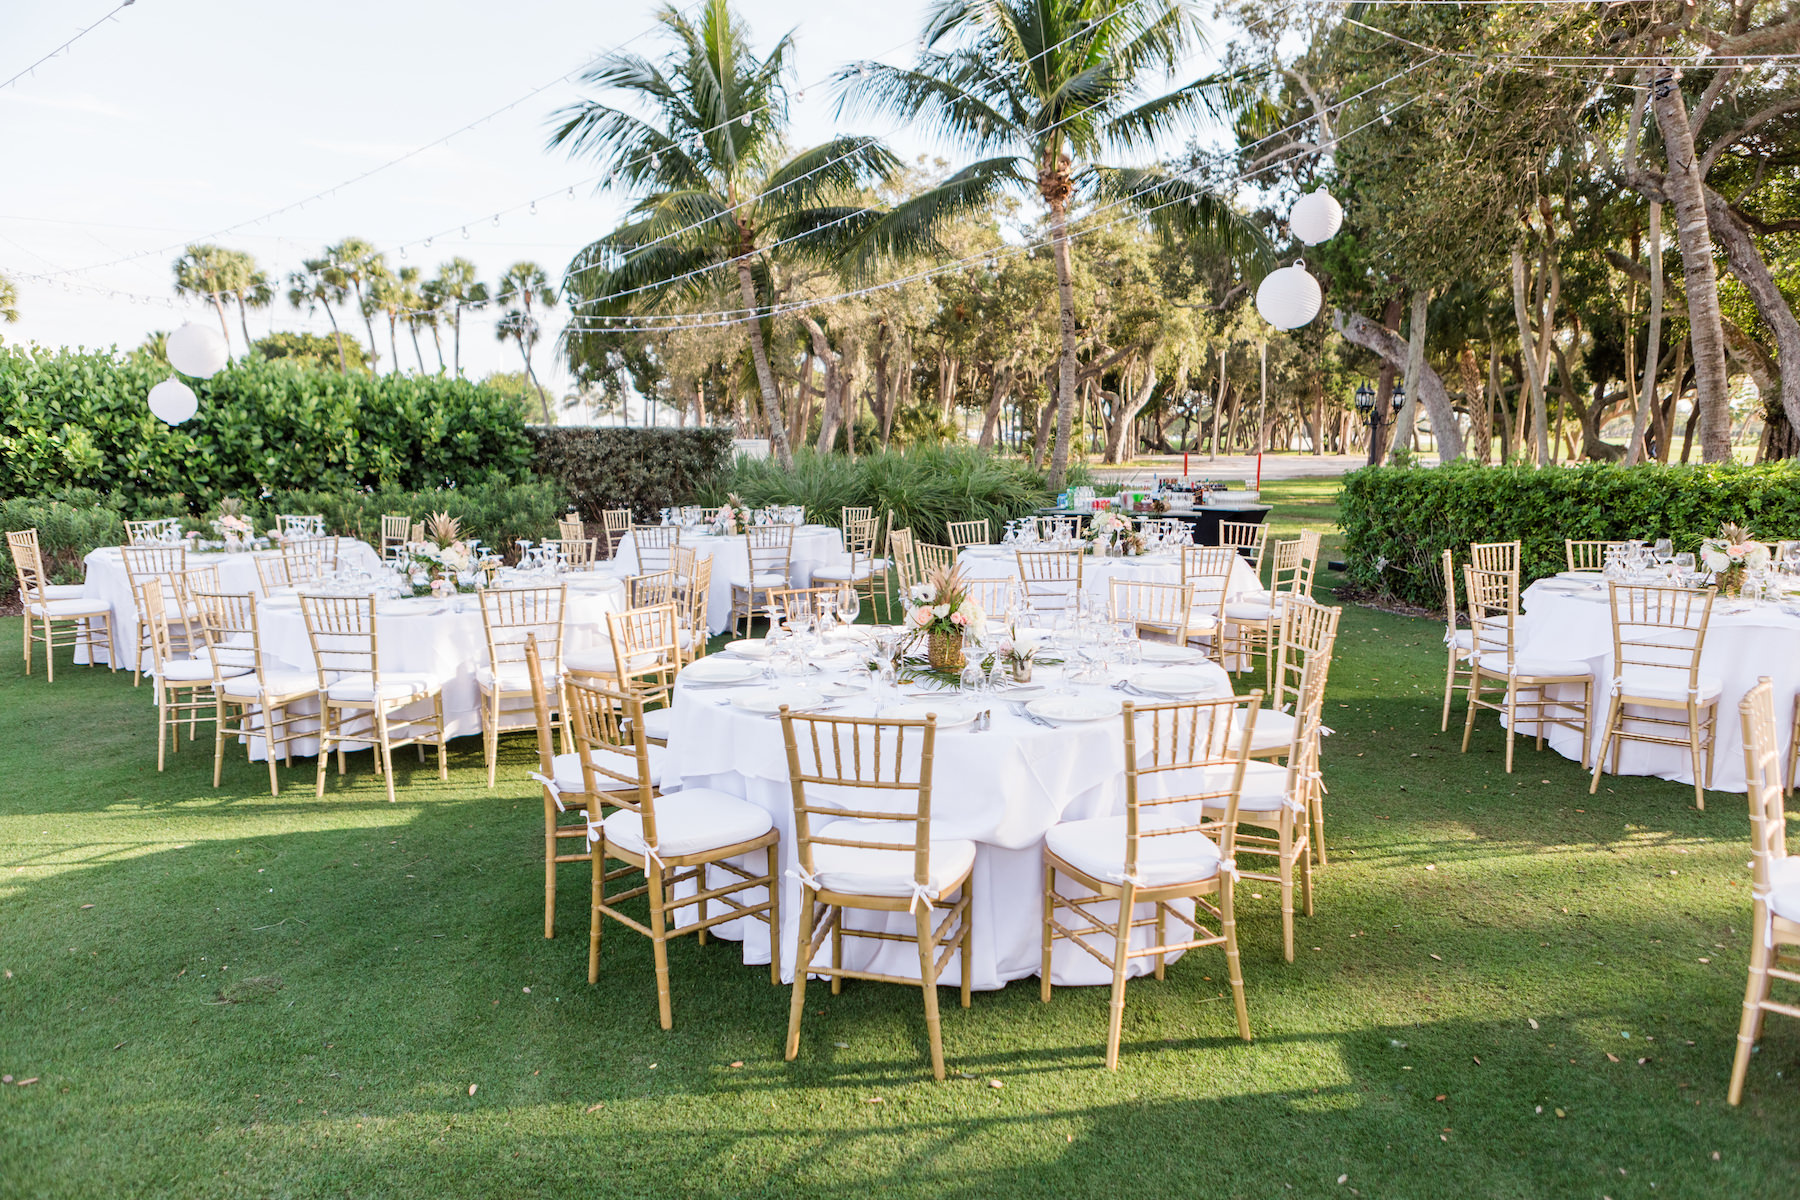 Elegant Outdoor Florida Lawn Wedding Reception with Hanging White Lanterns, White Linens and Gold Chiavari Chairs | Sarasota Wedding Venue The Resort at Longboat Key Club